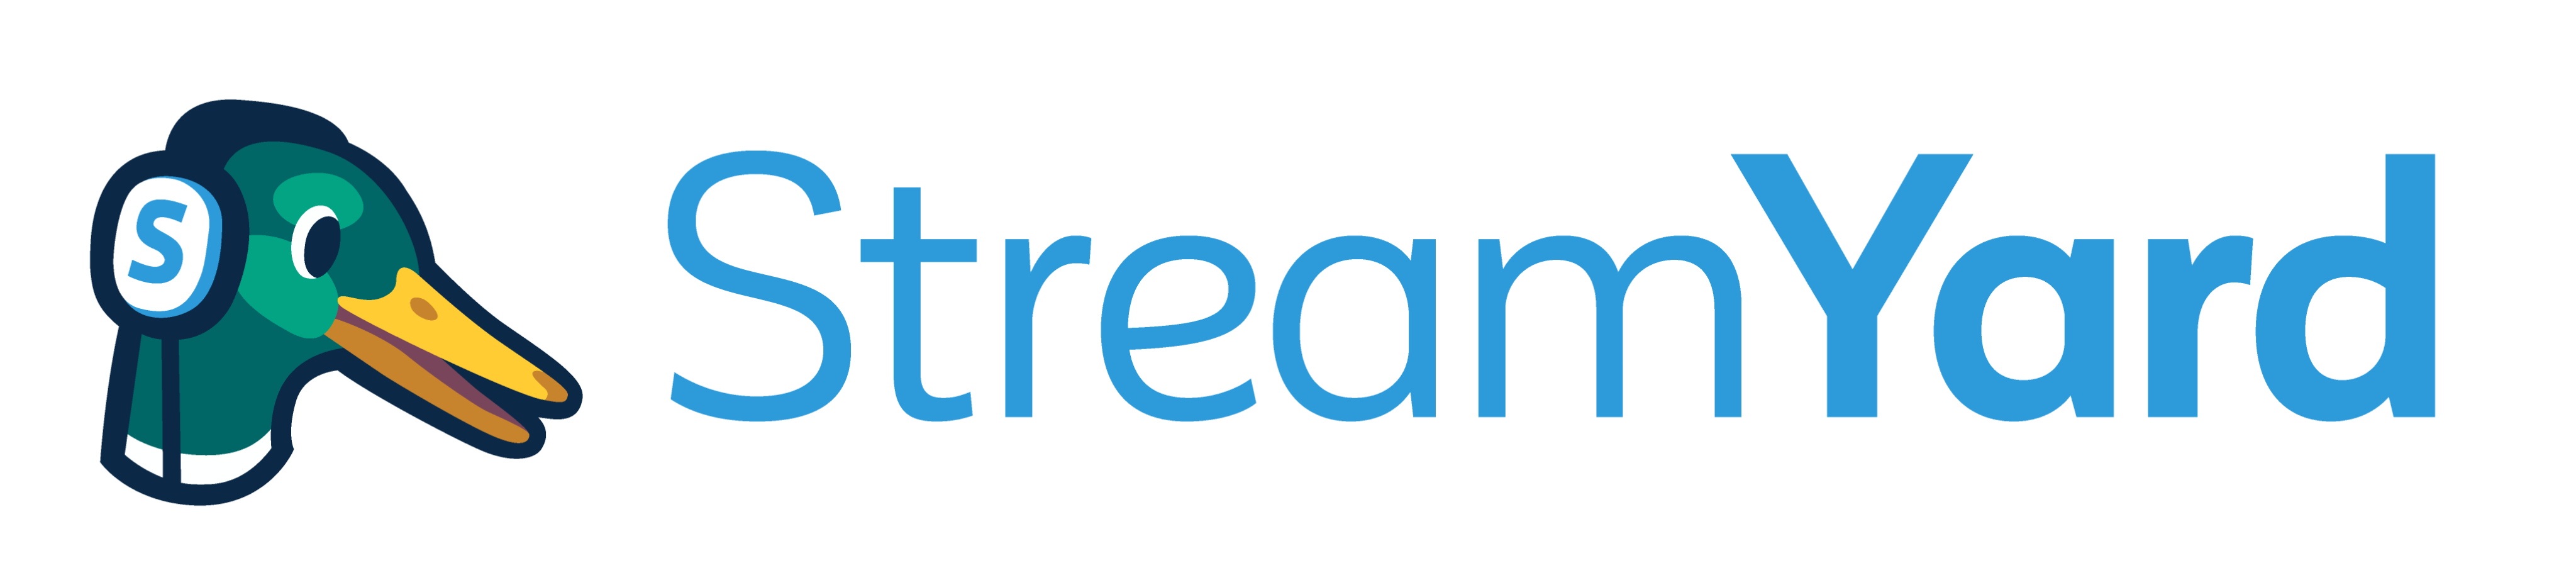 Streamyard